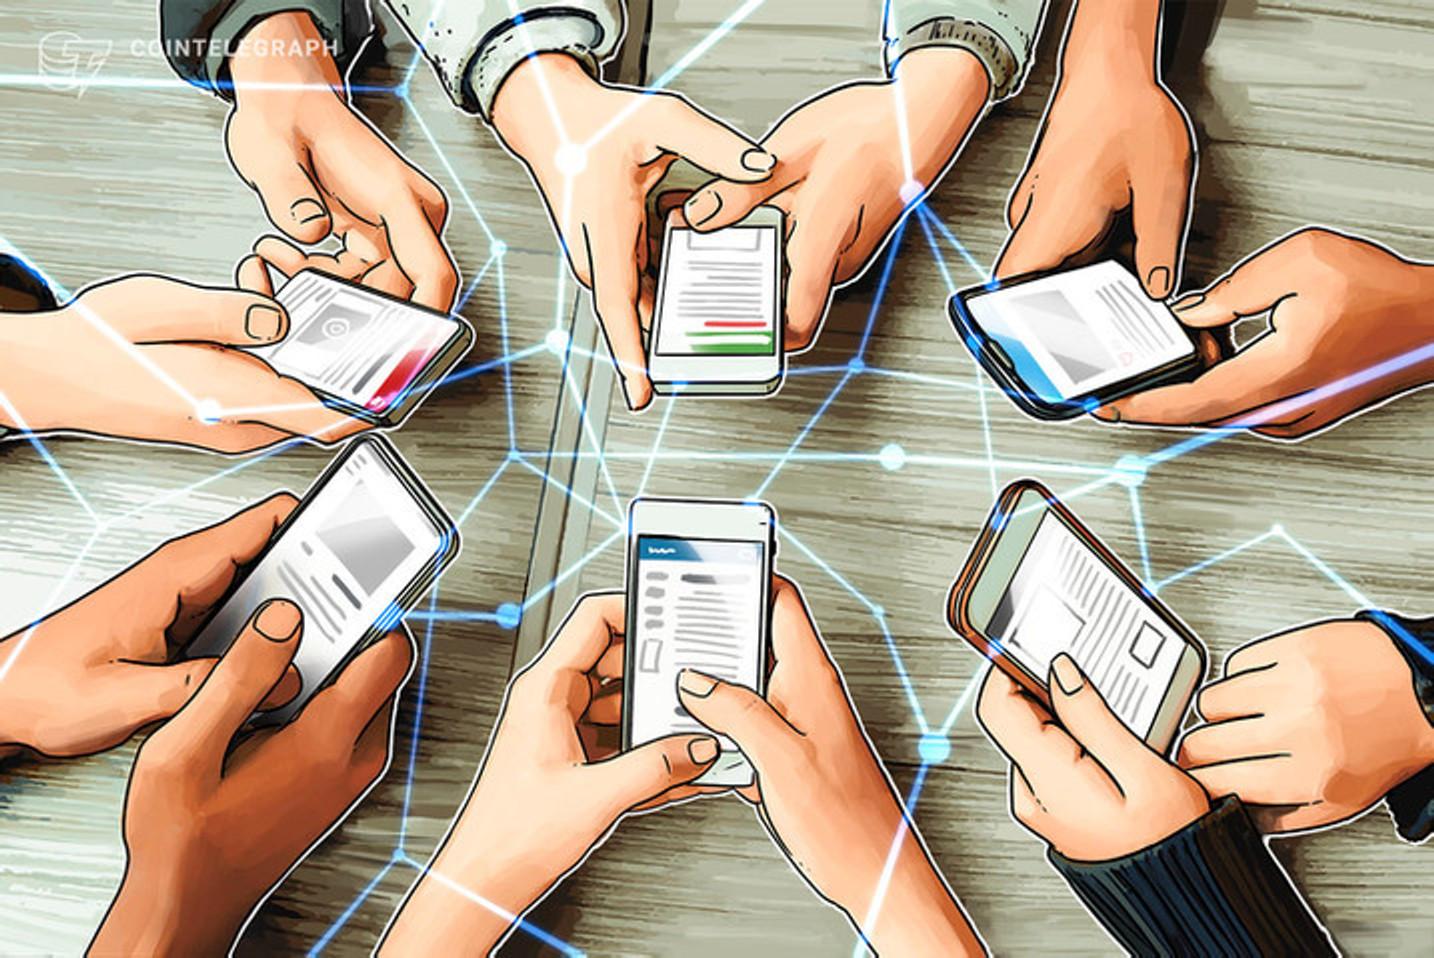 Banco Interamericano financiará projeto de tecnologia blockchain no Distrito Federal